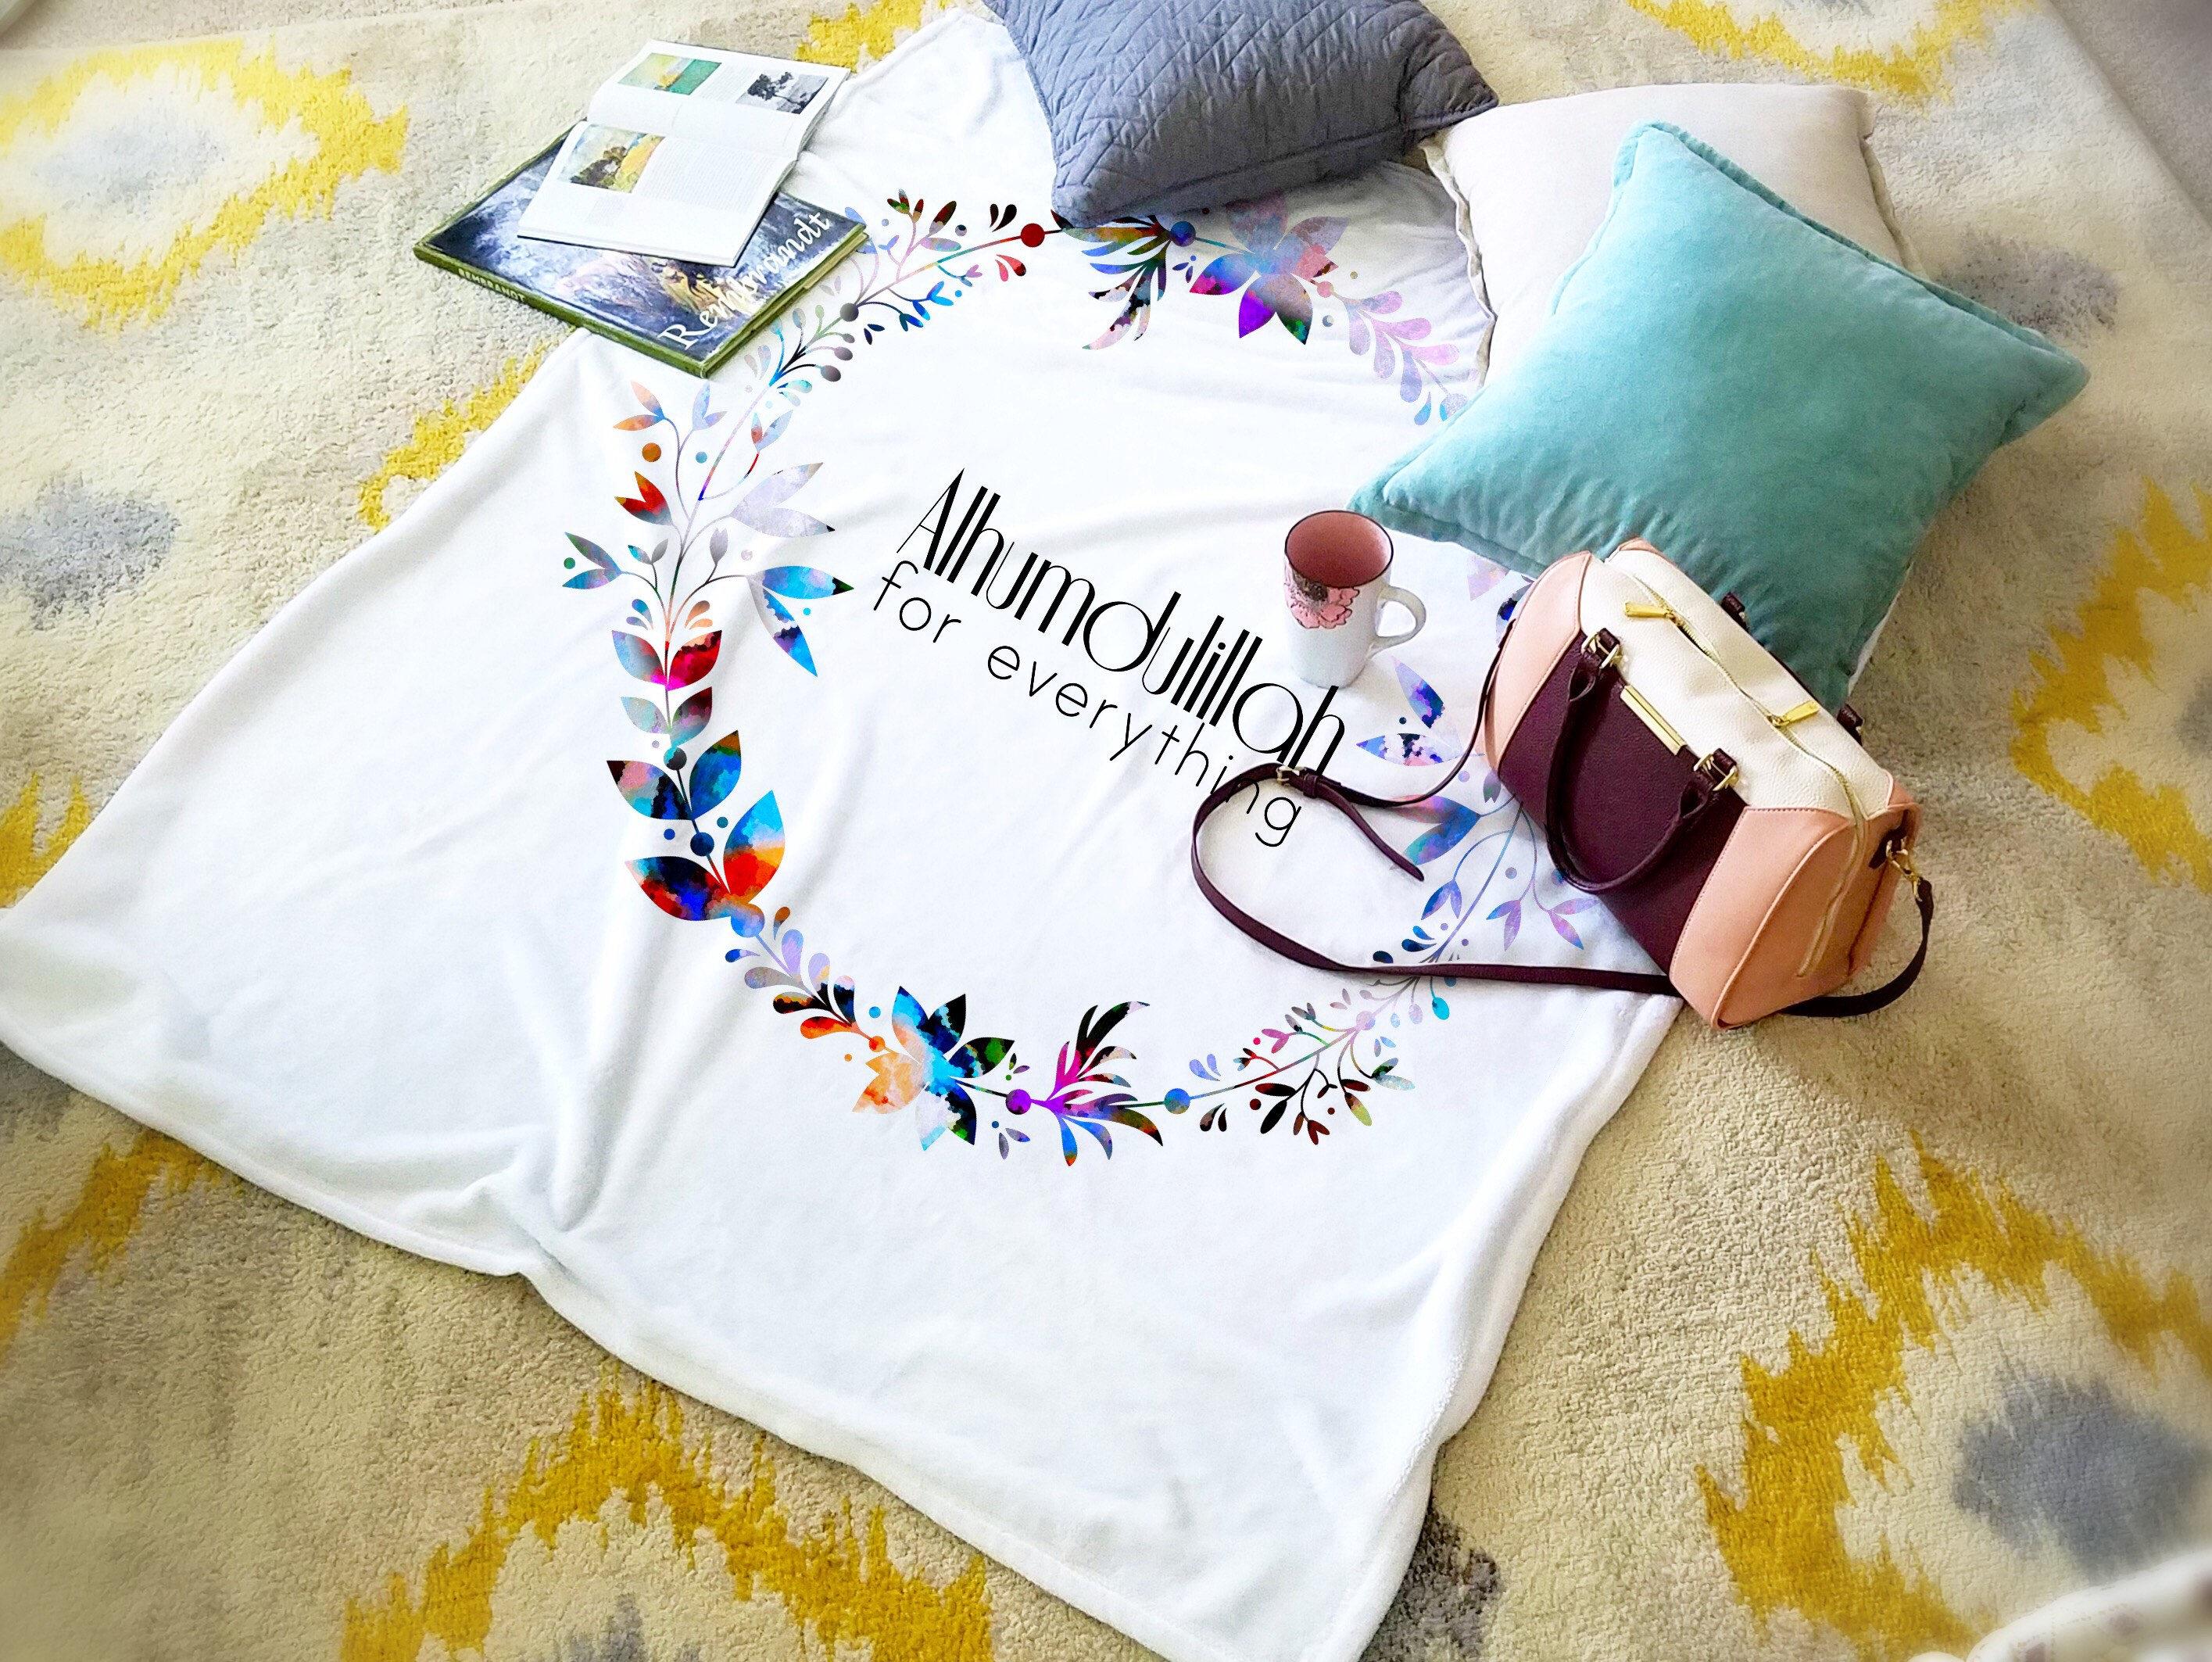 Contemporary Wedding Gifts: Modern Islamic Decor Islamic Blanket MashaAllah Blanket